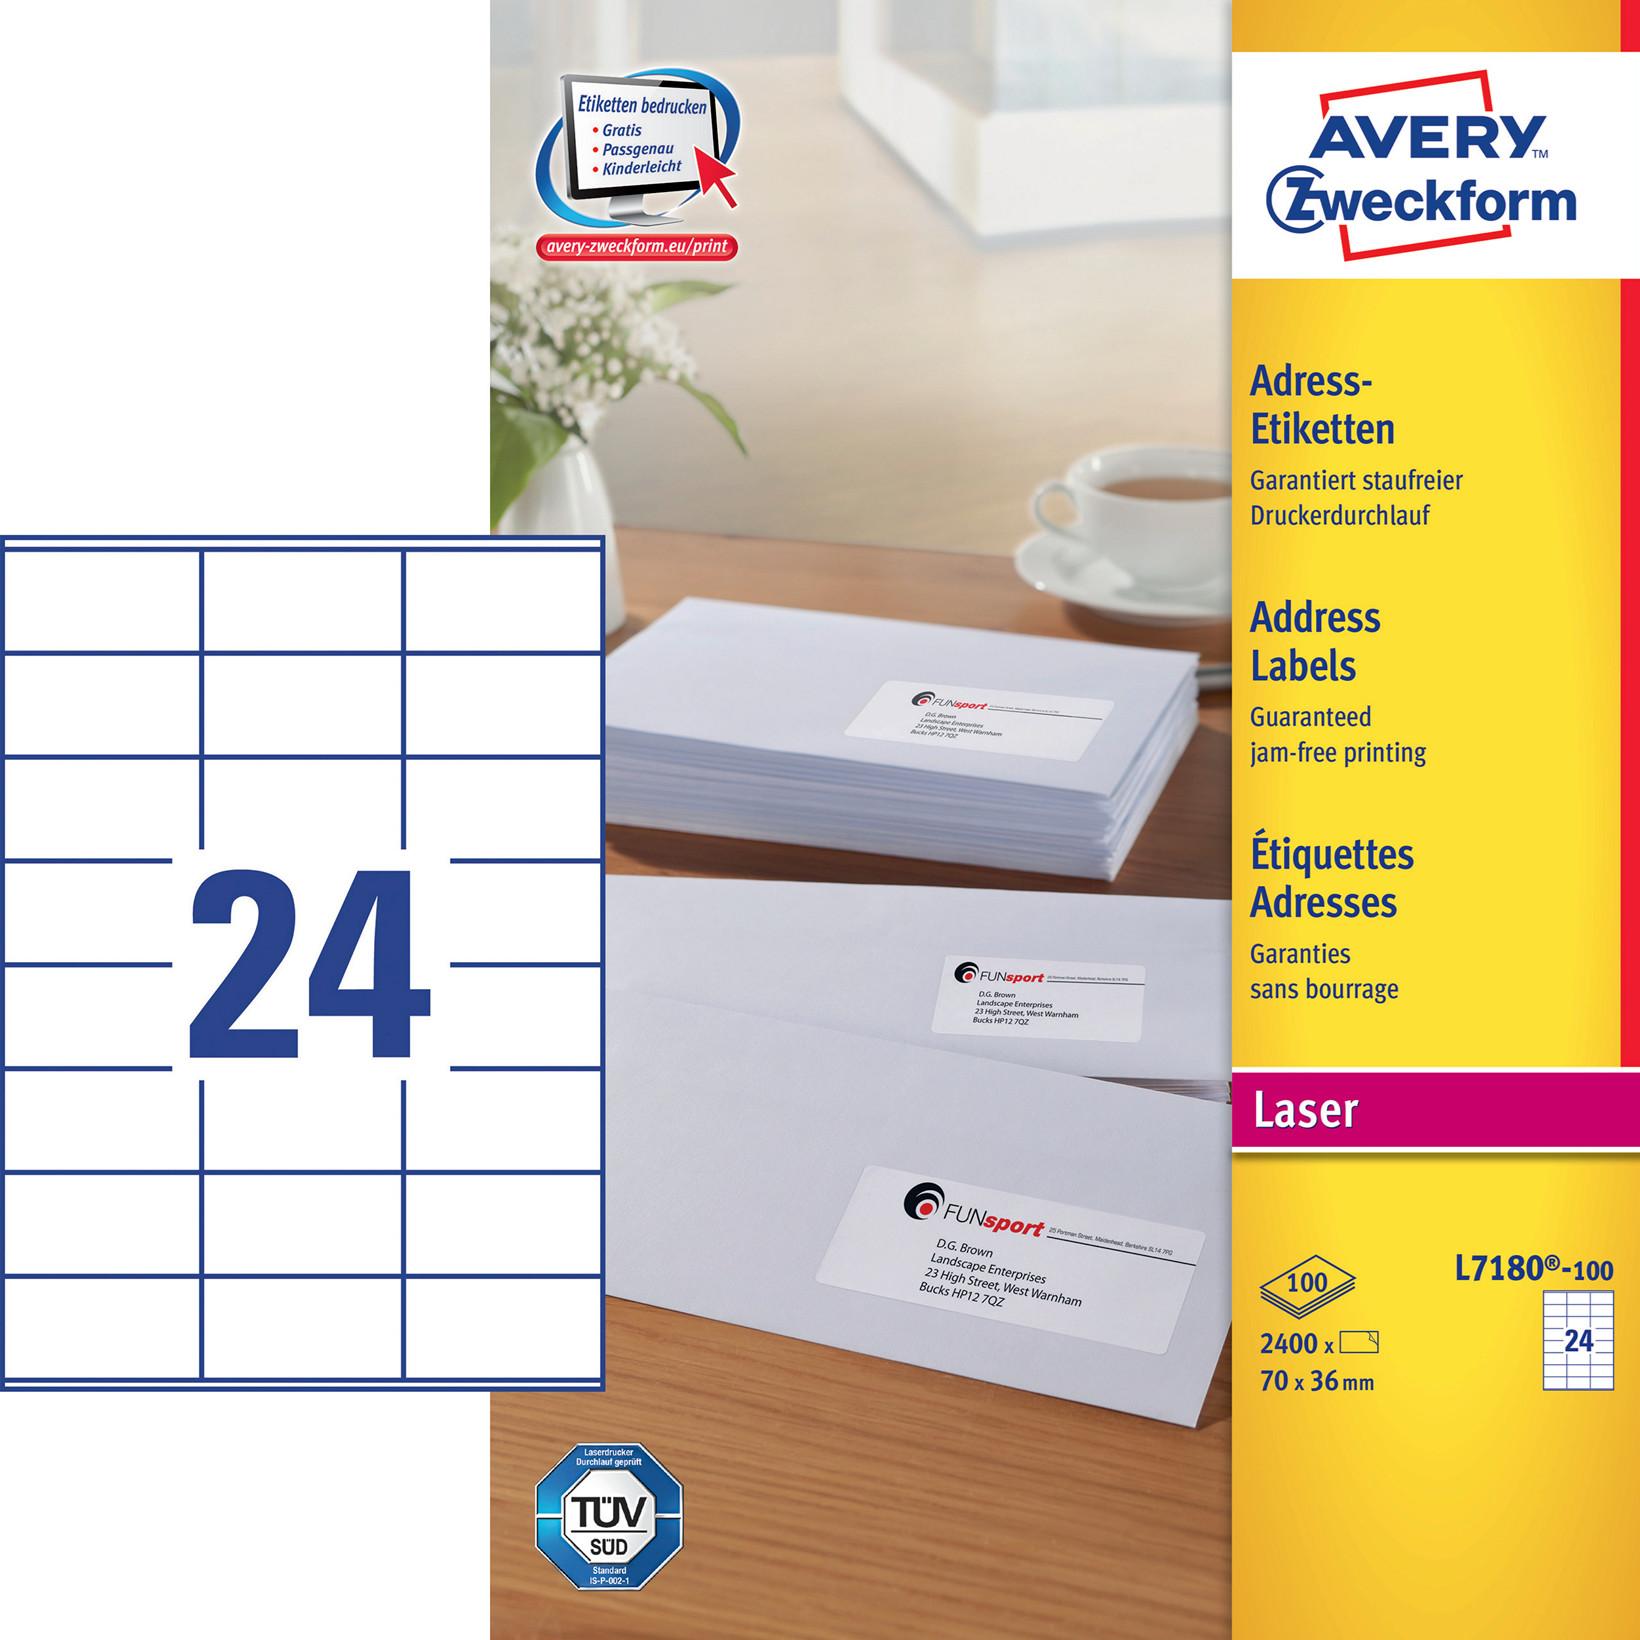 Avery L7180 - Laser label 24 pr. ark 70 x 36 mm - 100 ark